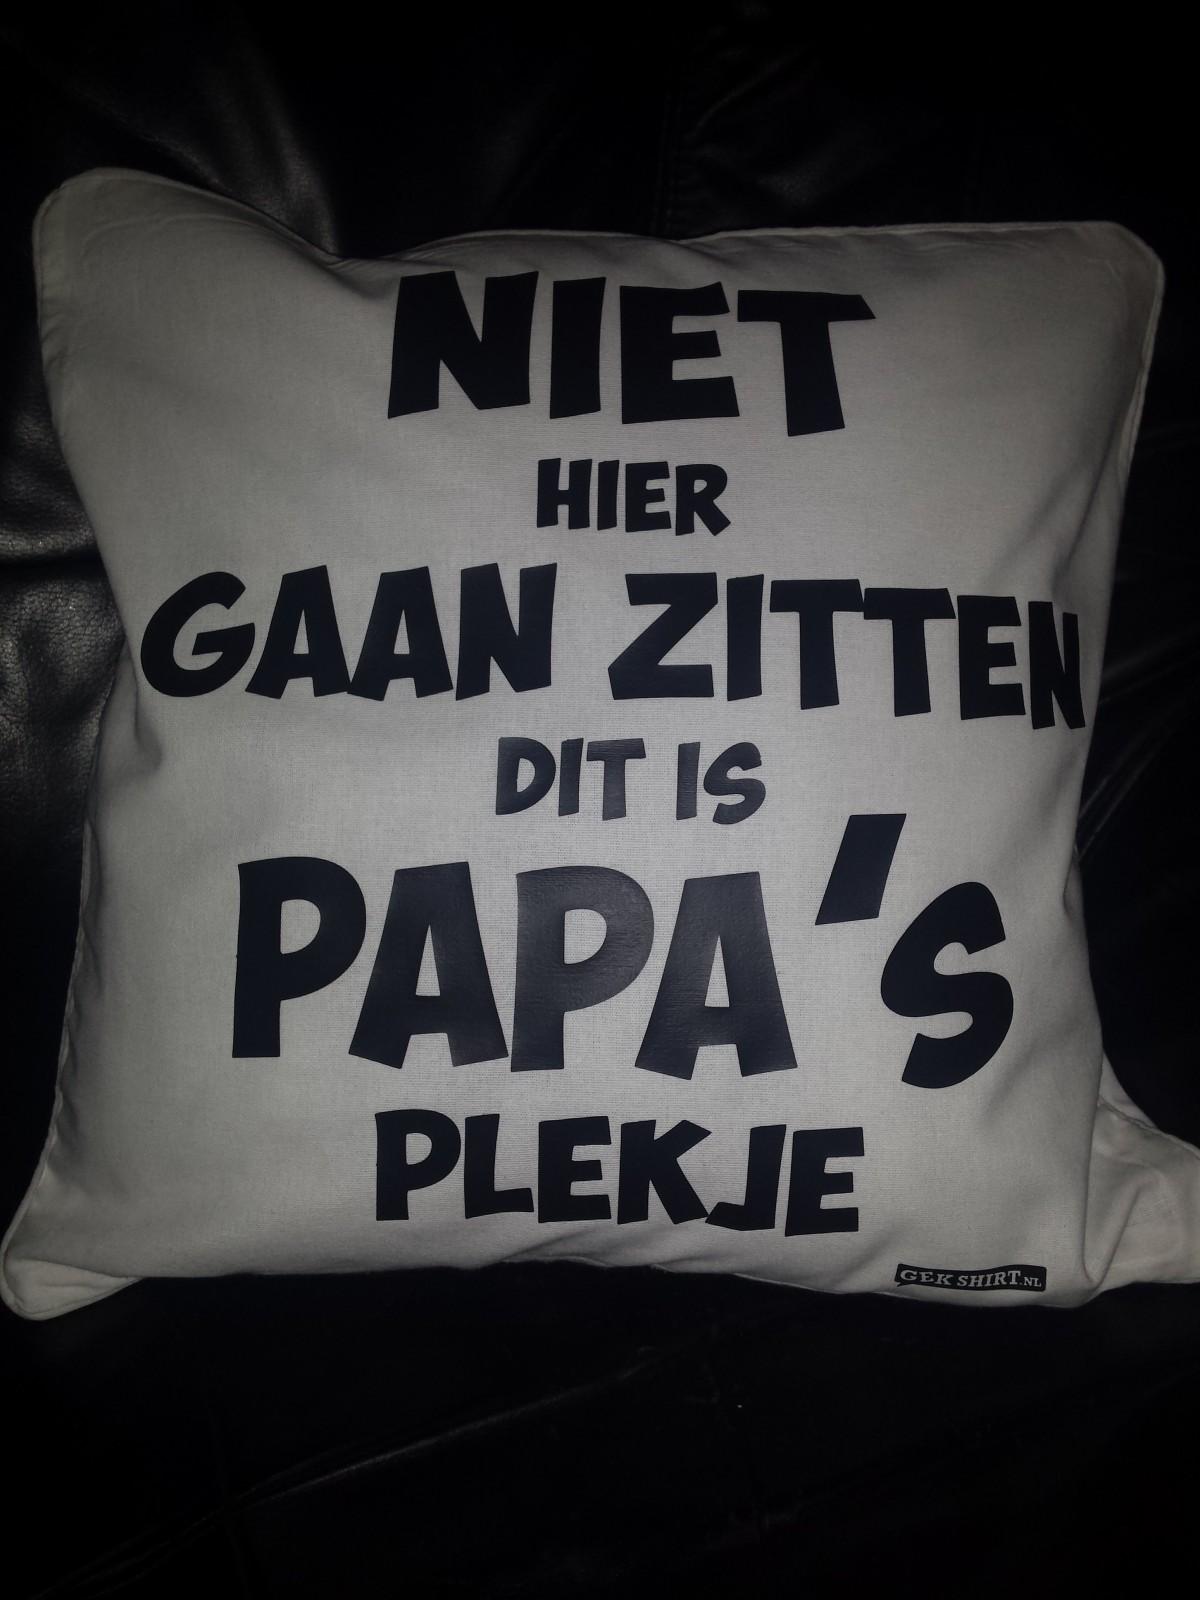 Origineel Cadeau Sinterklaas